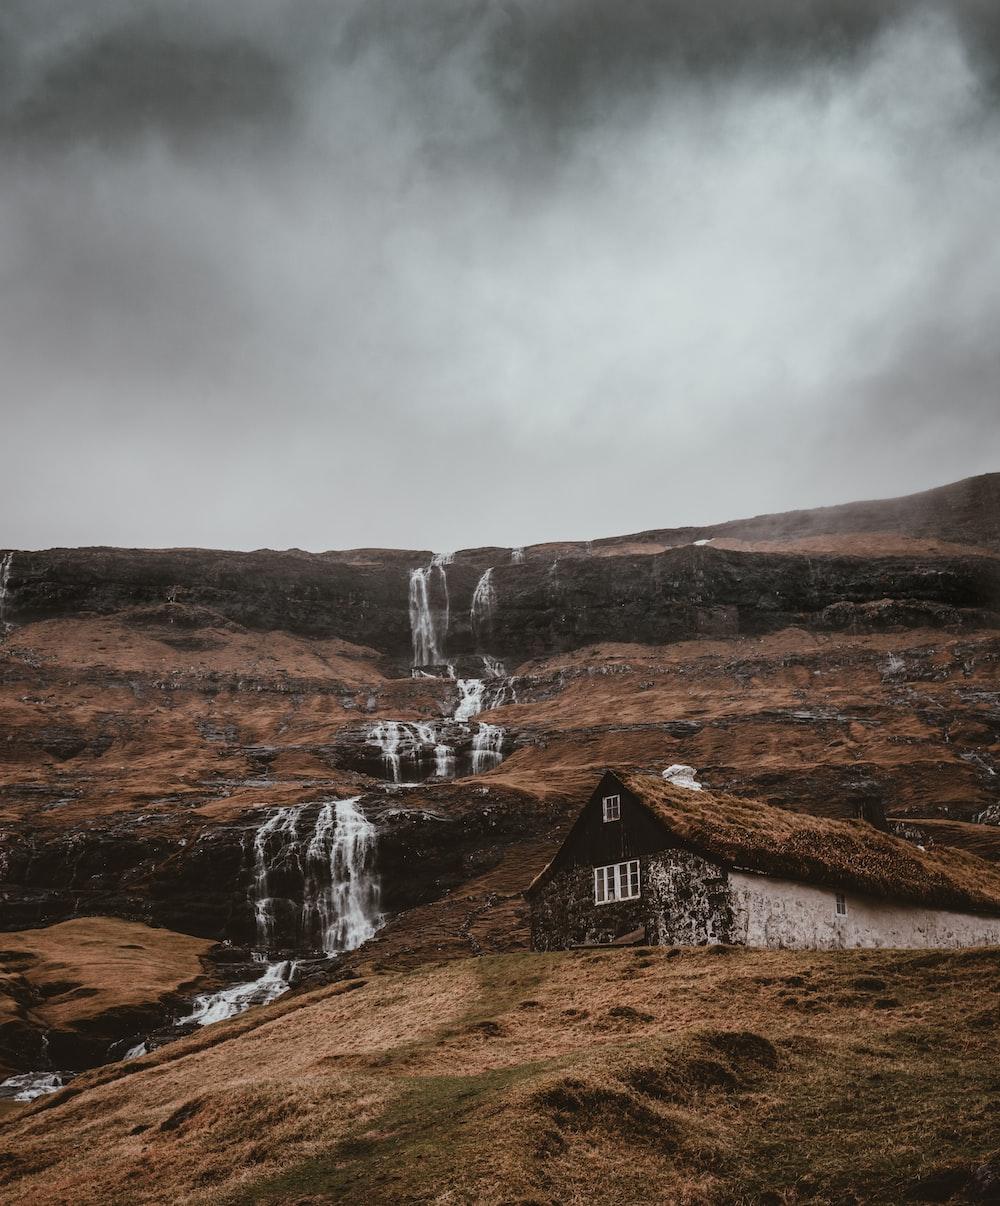 waterfalls near wooden house under gray skies